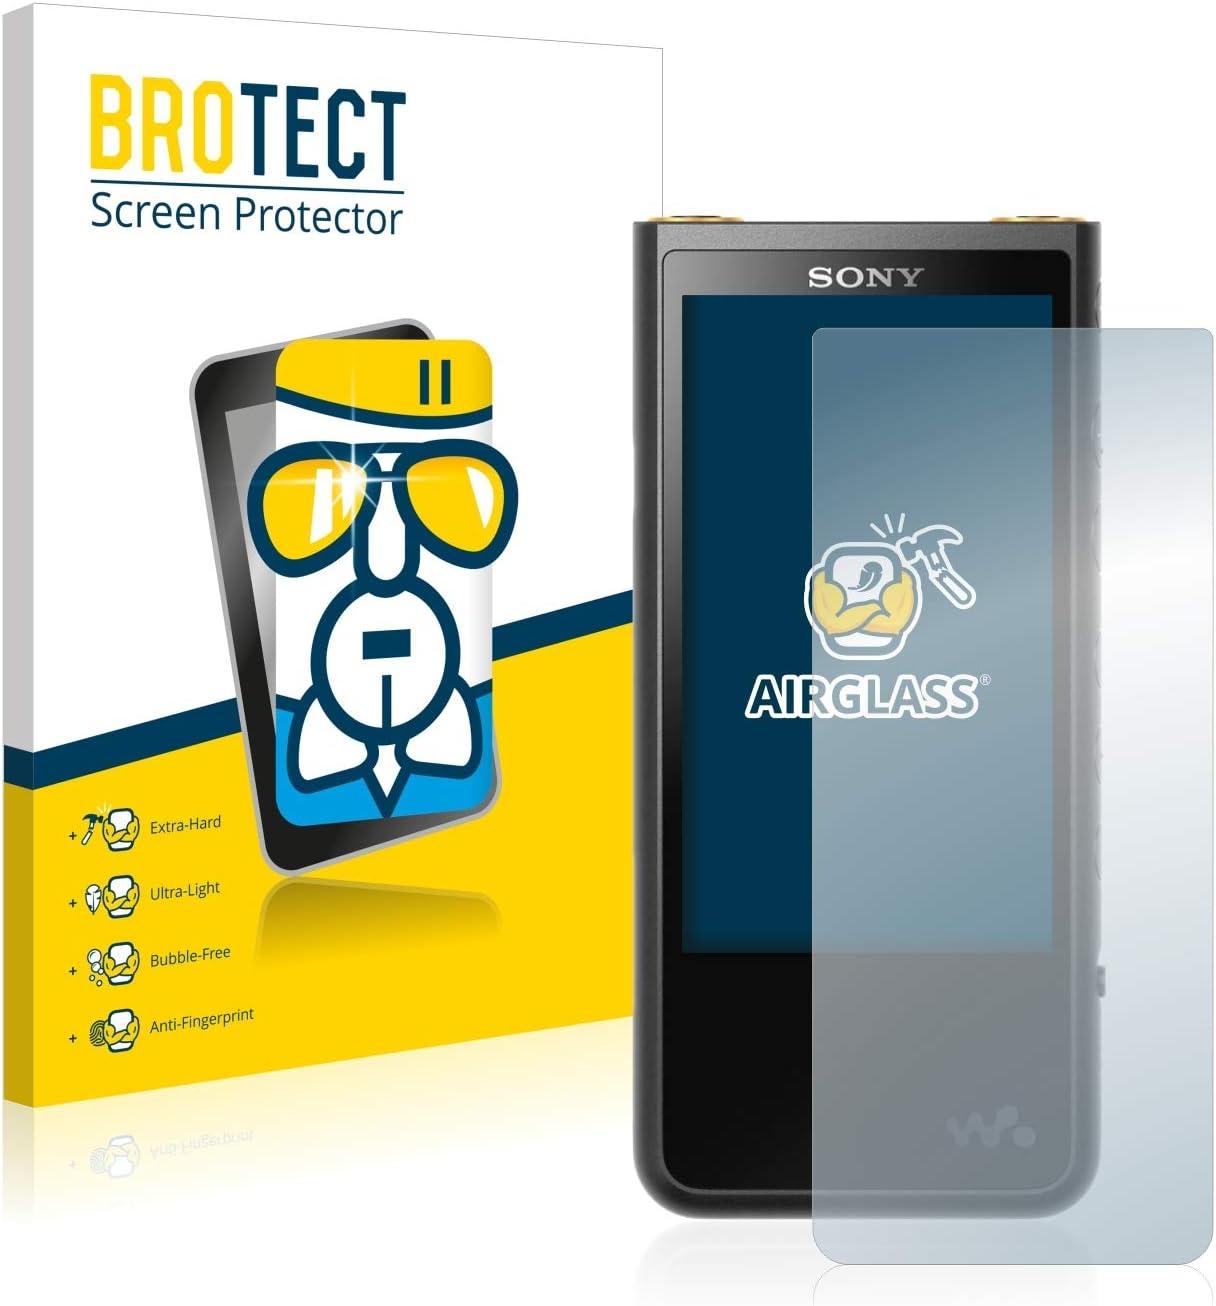 AirGlass Glass Screen Protector for Atos Worldline Yomani Ultra-Light Extra-Hard Screen Guard BROTECT